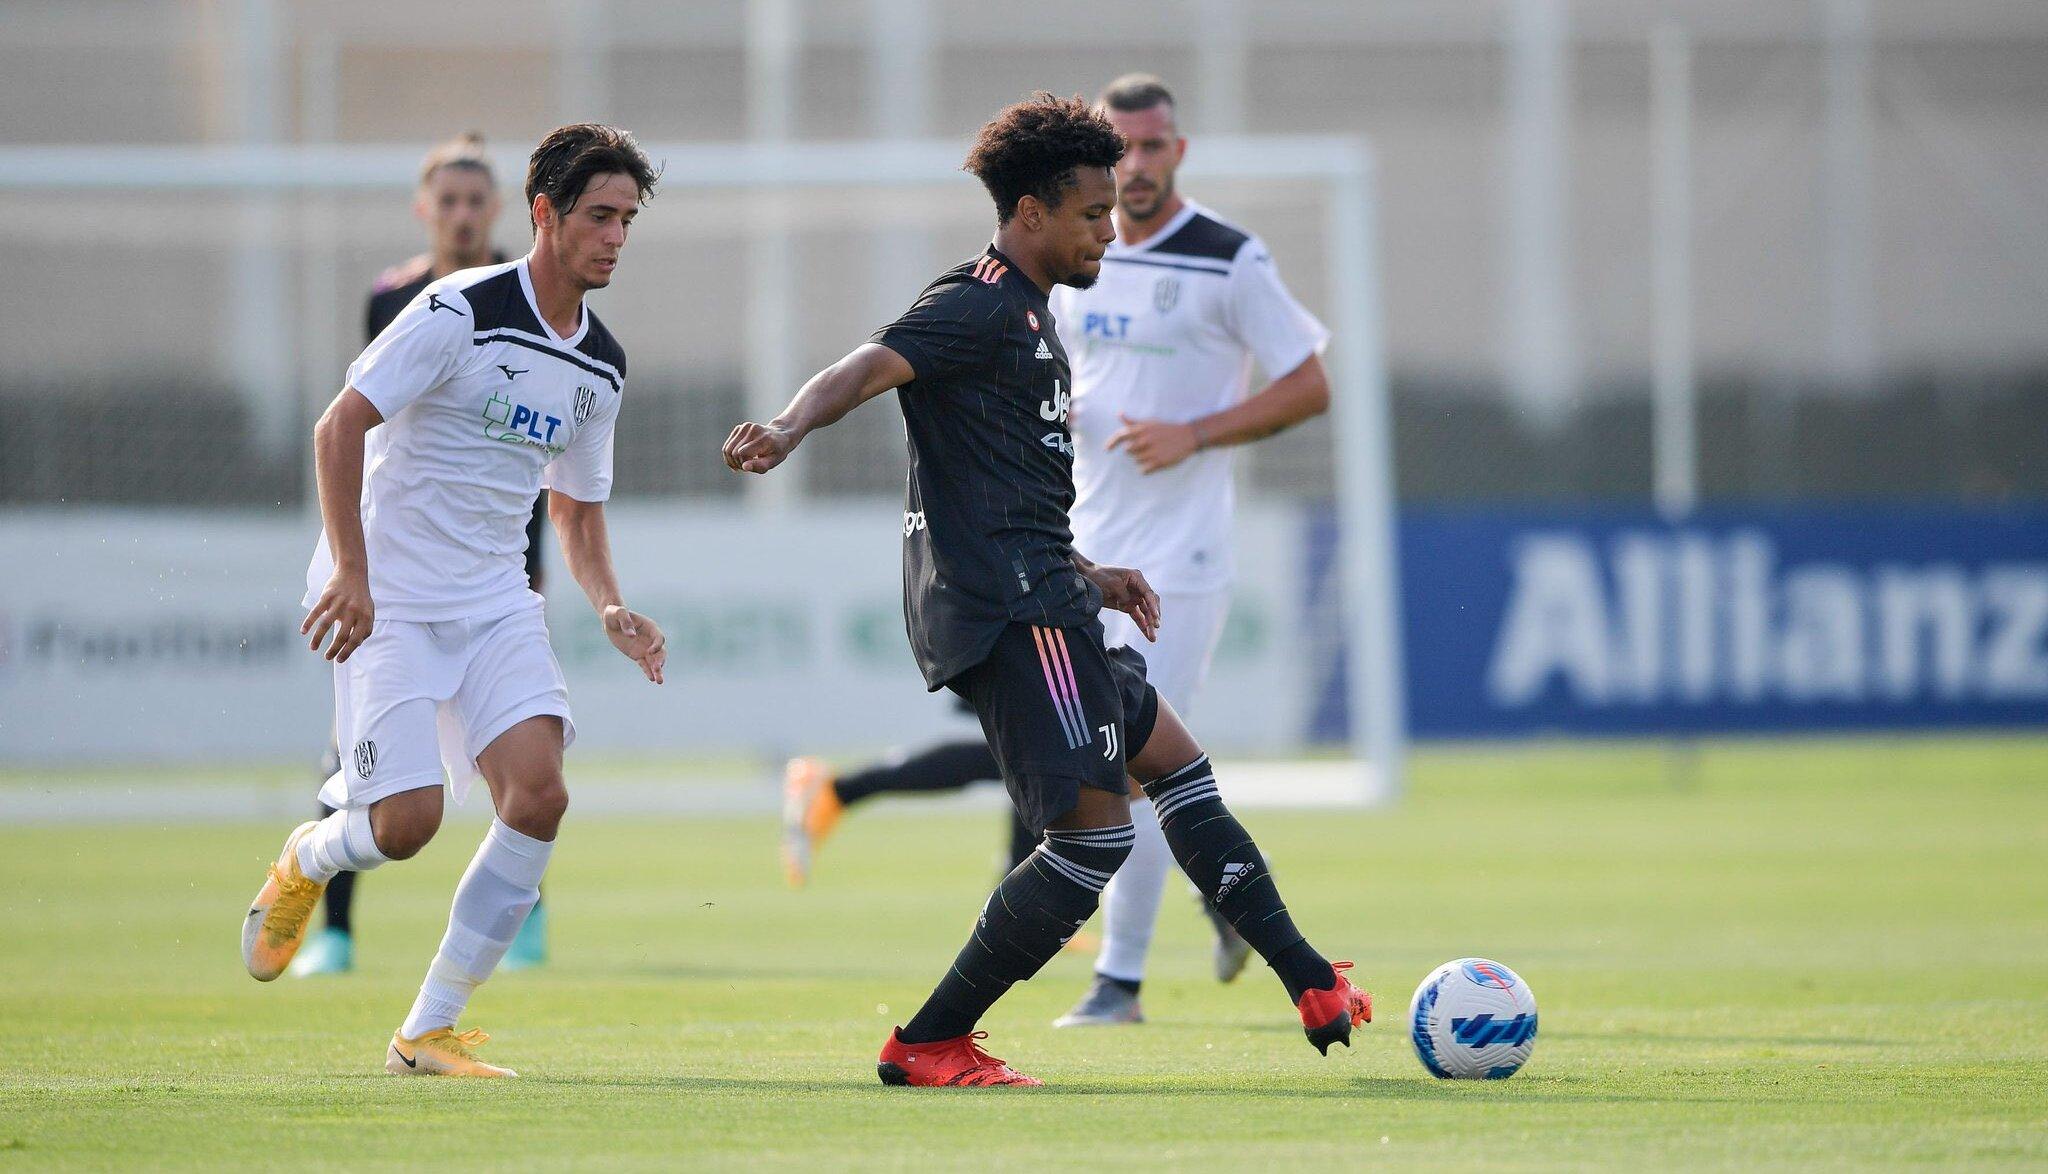 Tanti assenti, ma la Juventus di Allegri parte bene: 3-1 al Cesena |  Sport e Vai